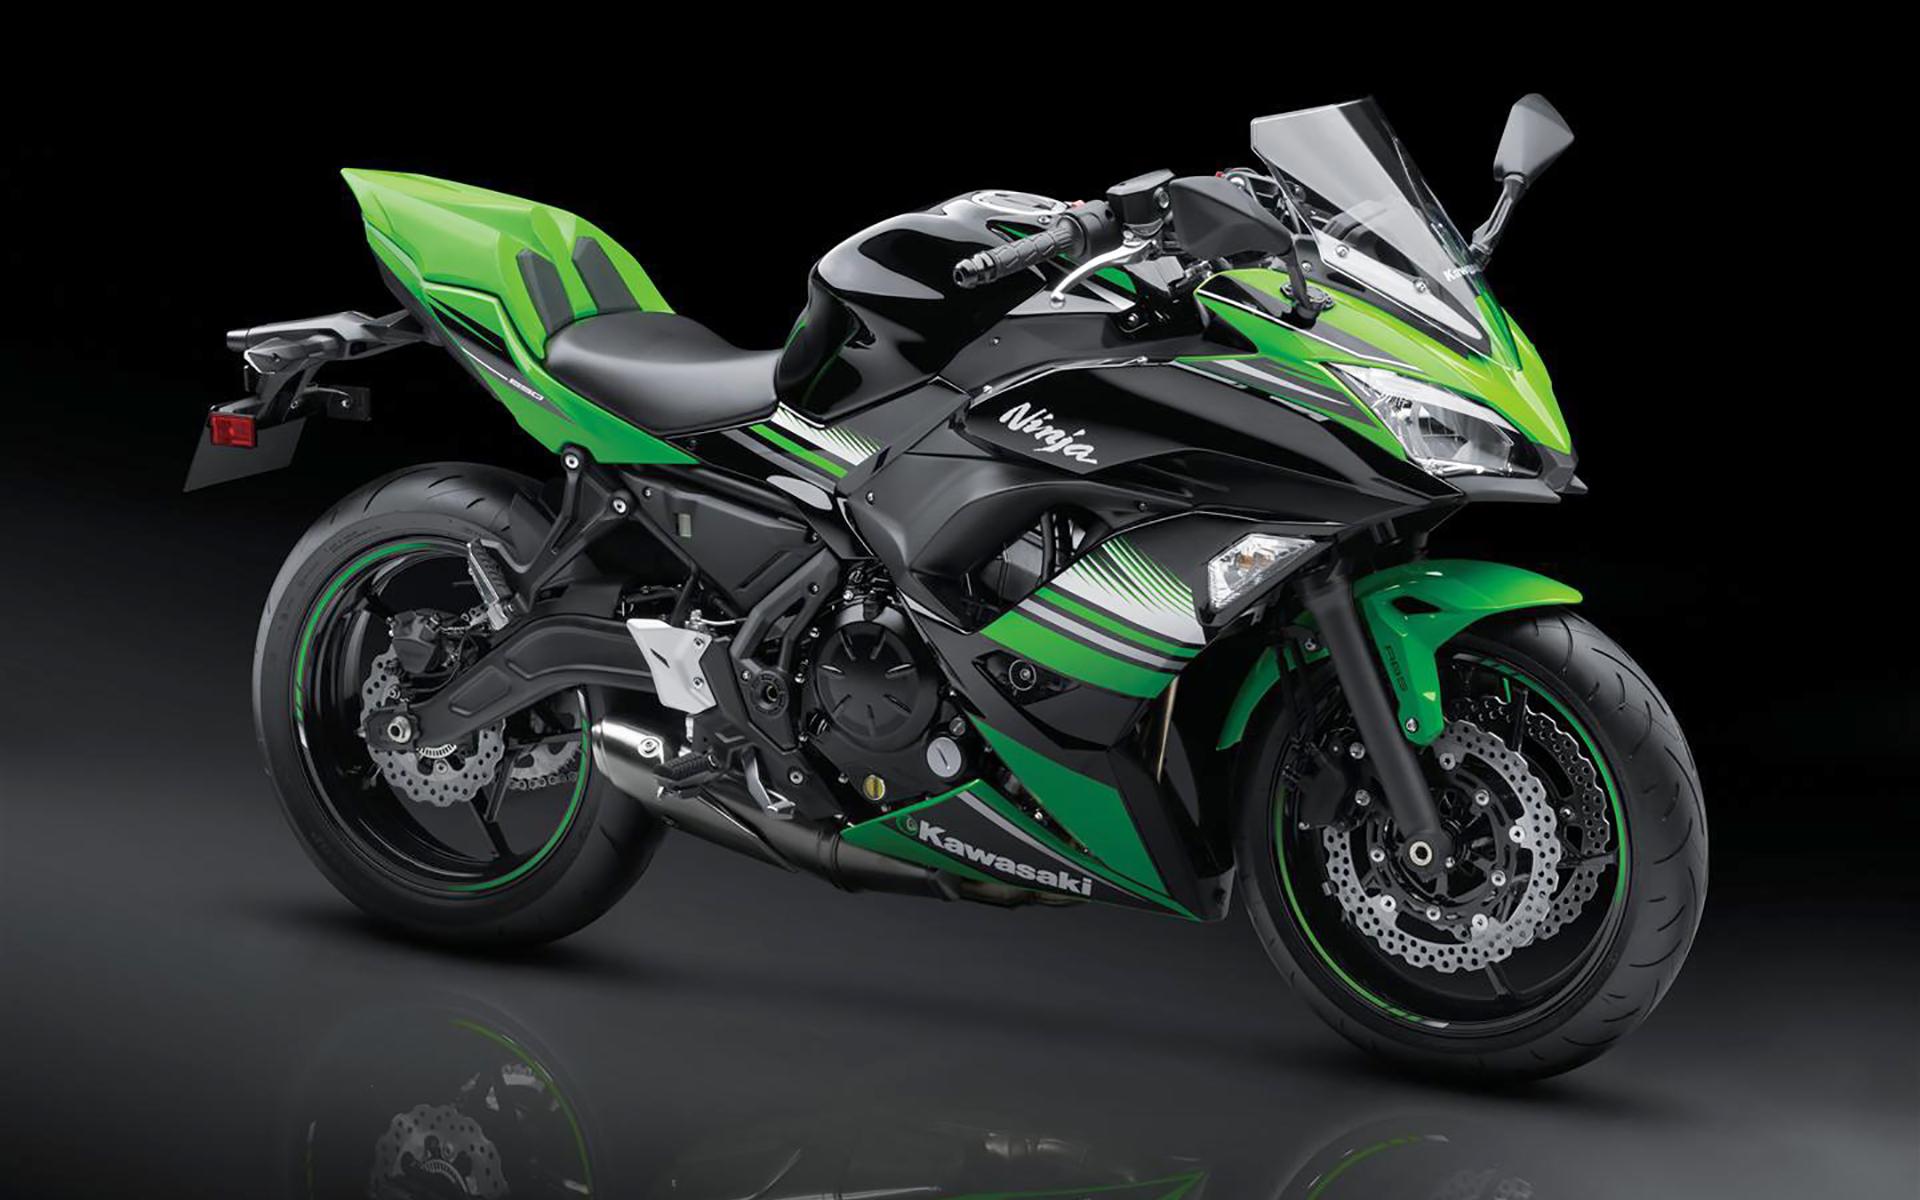 Kawasaki Motorcycle Parts Online Australia